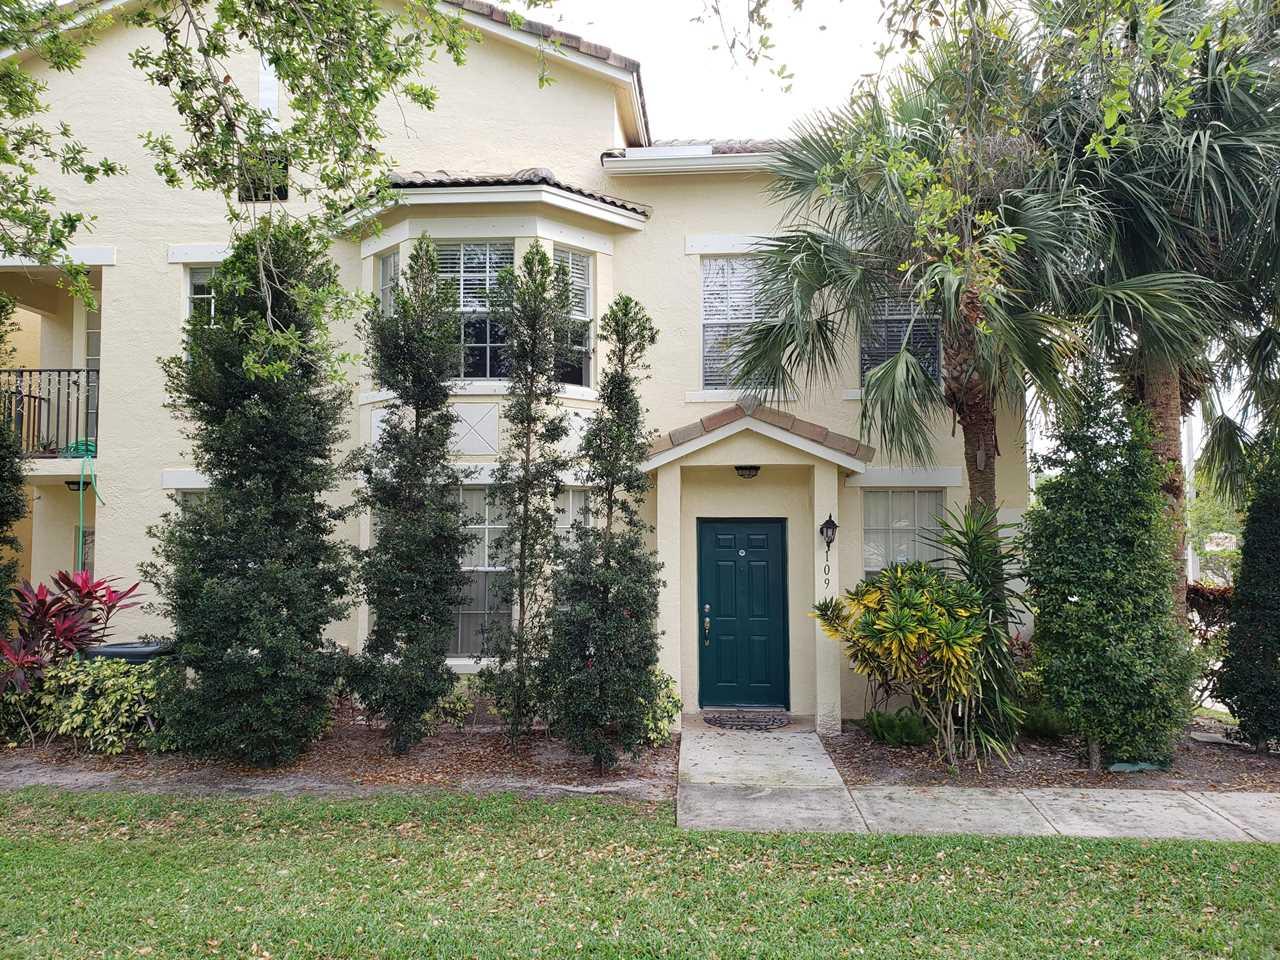 109 Belmont Place Boynton Beach, FL 33436 | MLS RX-10513118 Photo 1